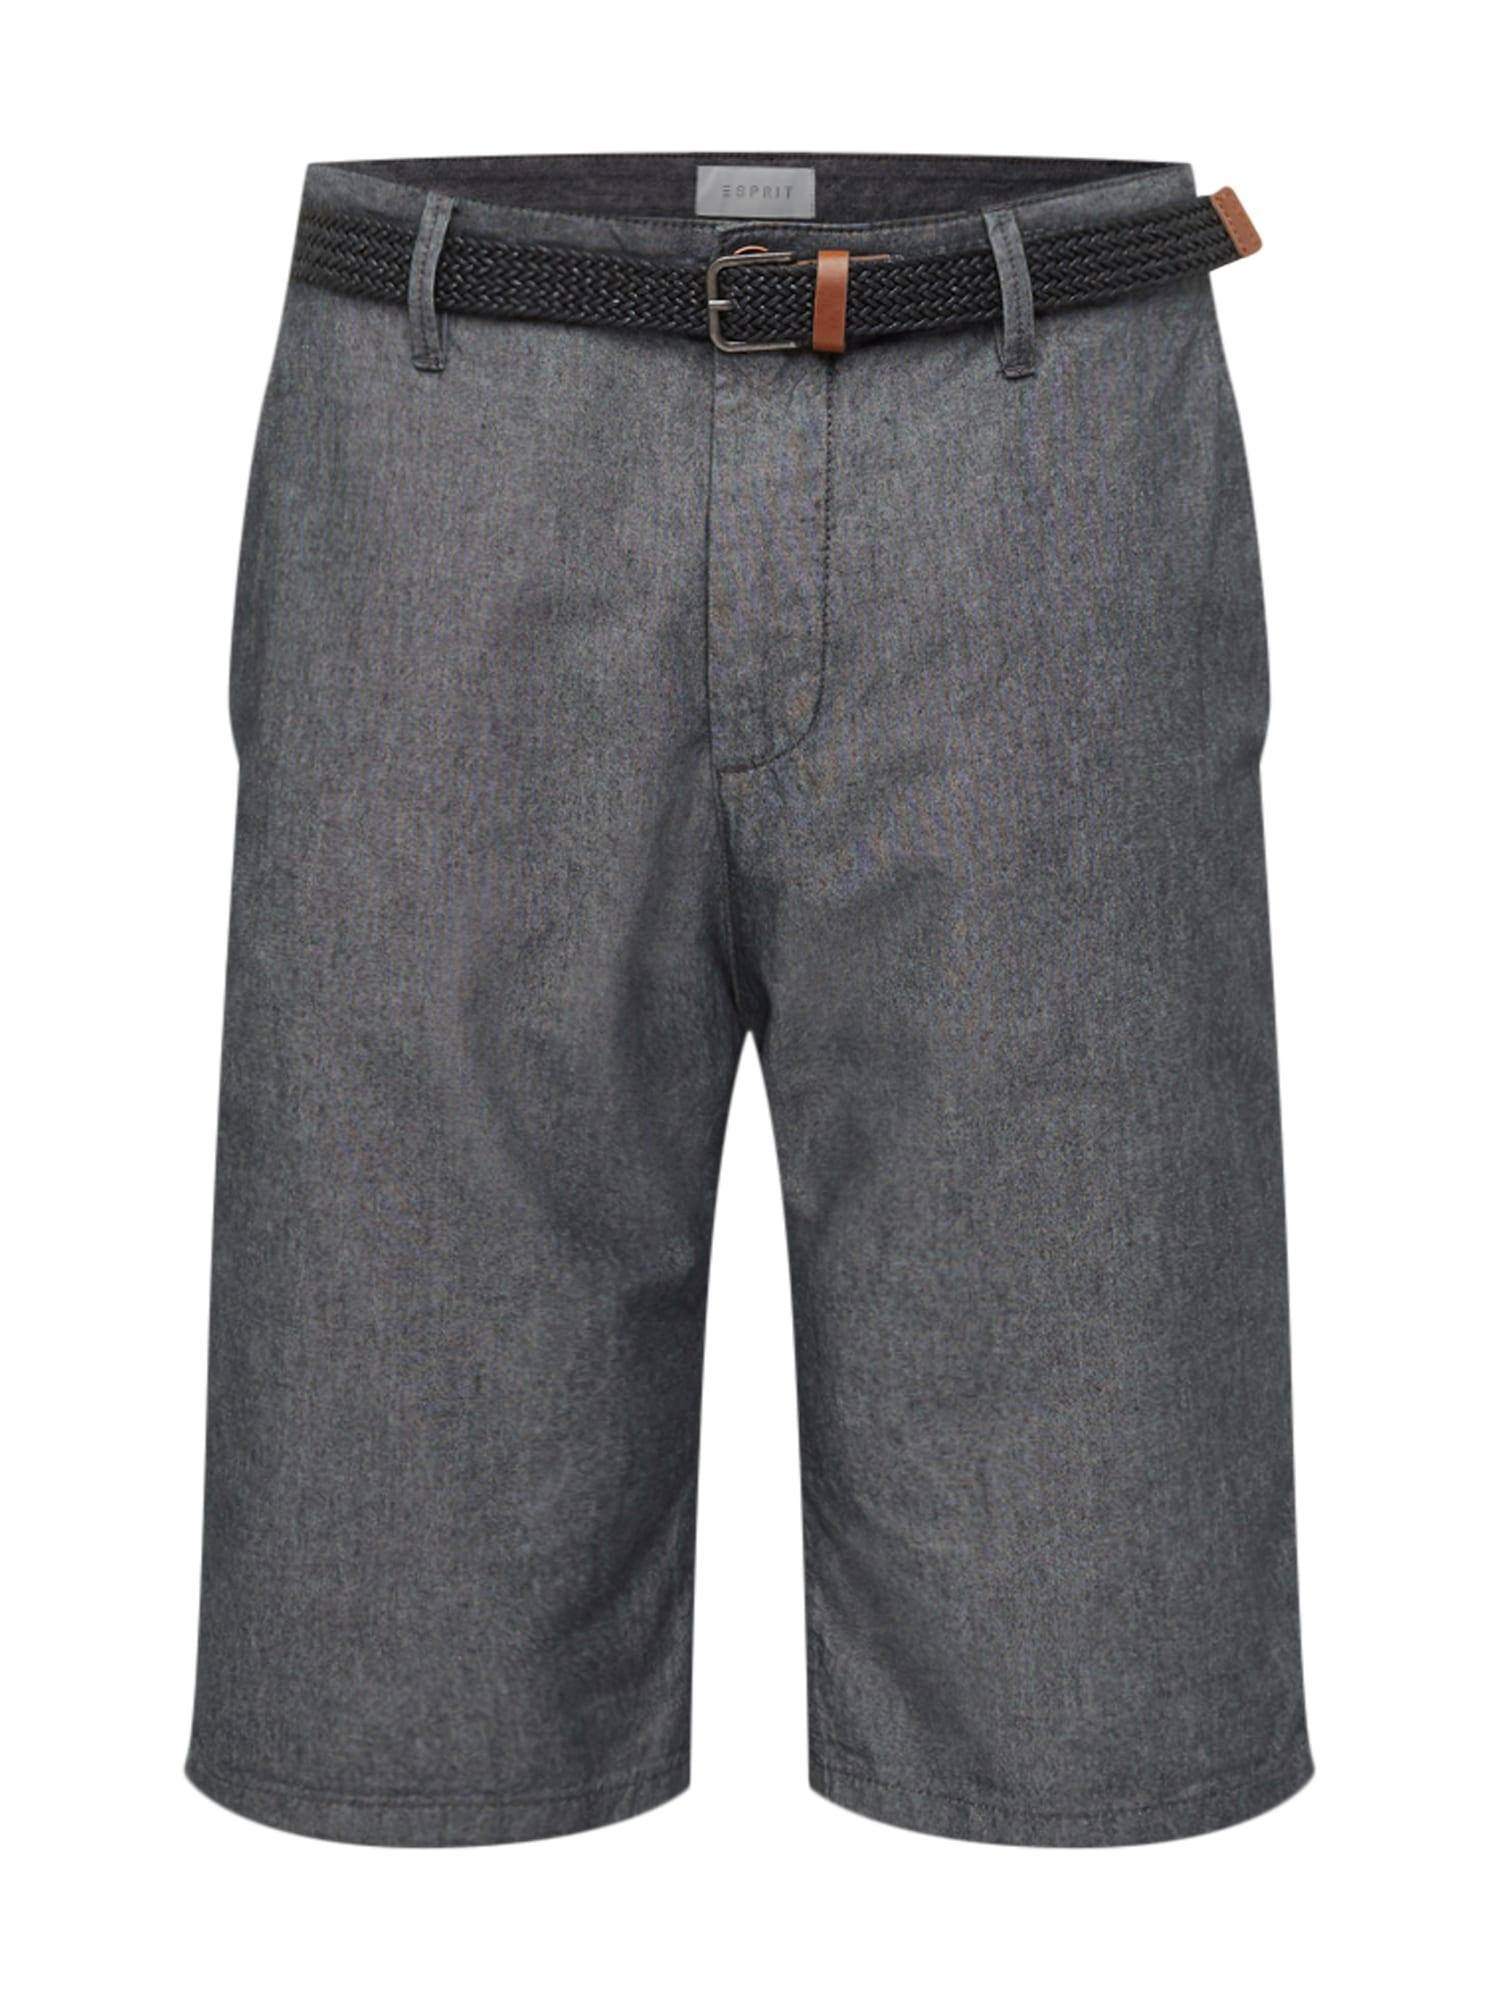 Chino kalhoty CHAMBRAY CHINO antracitová ESPRIT